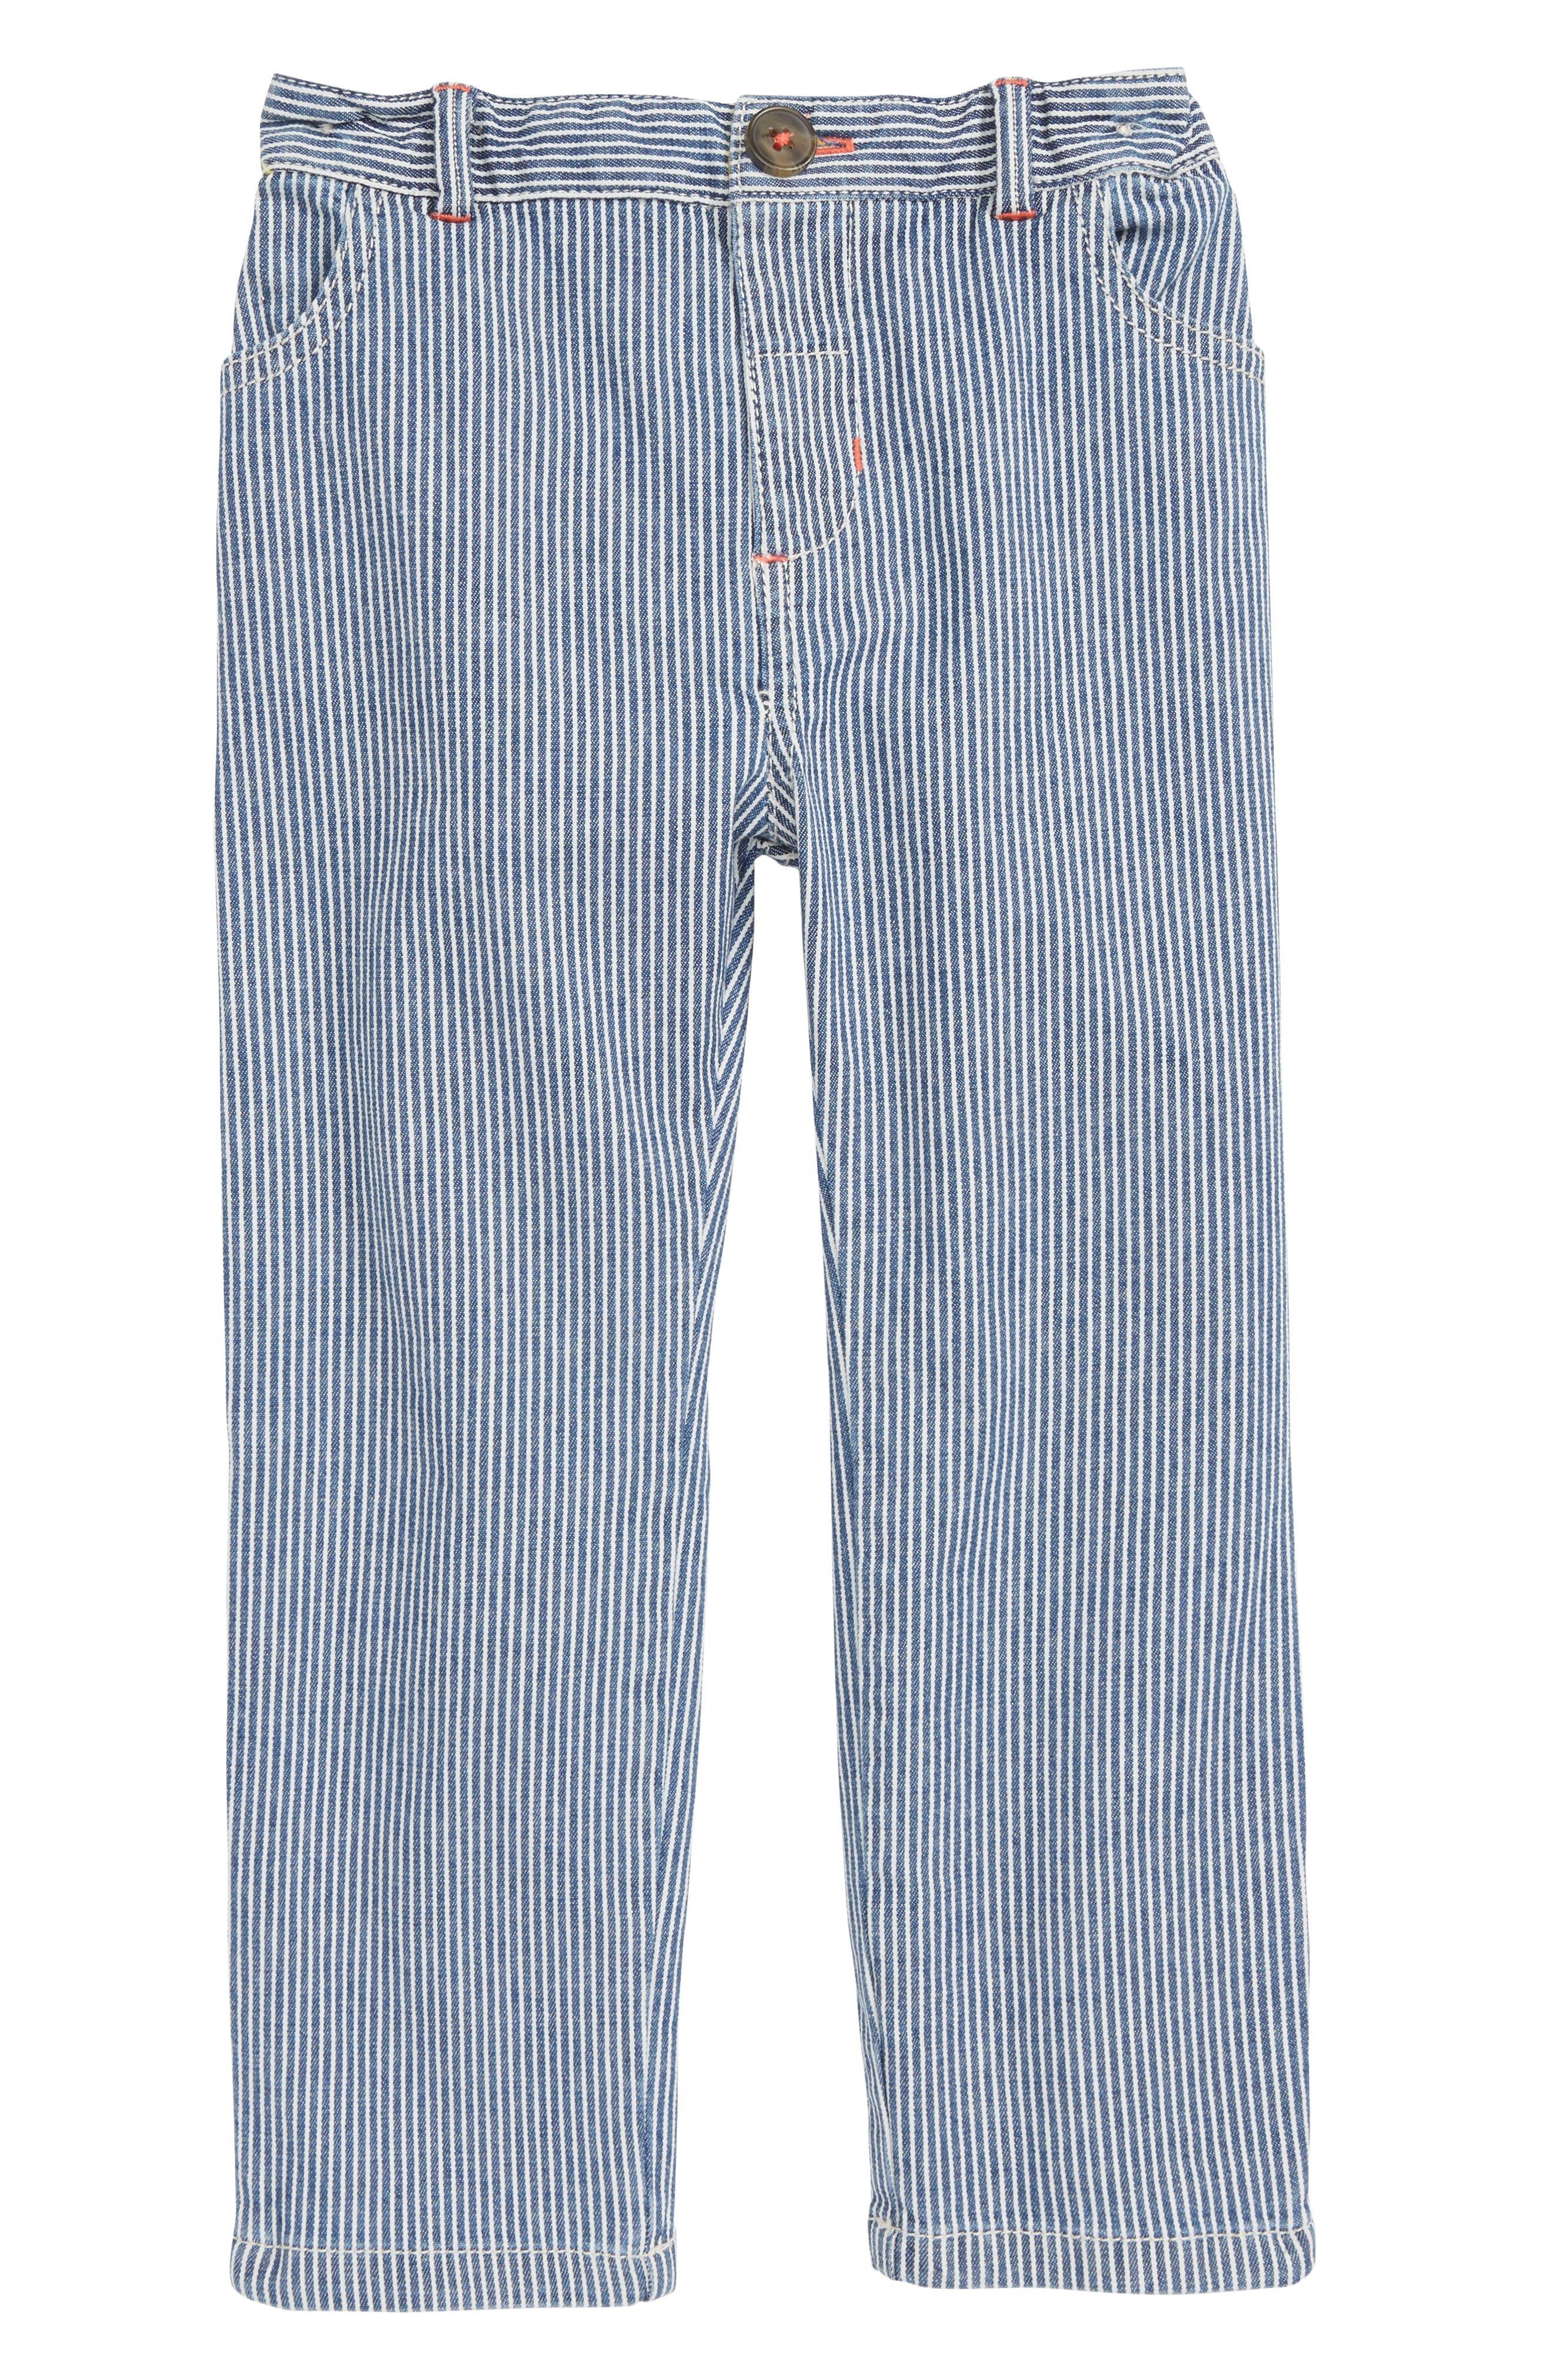 Toddler Boys Mini Boden Ticking Stripe Chino Pants